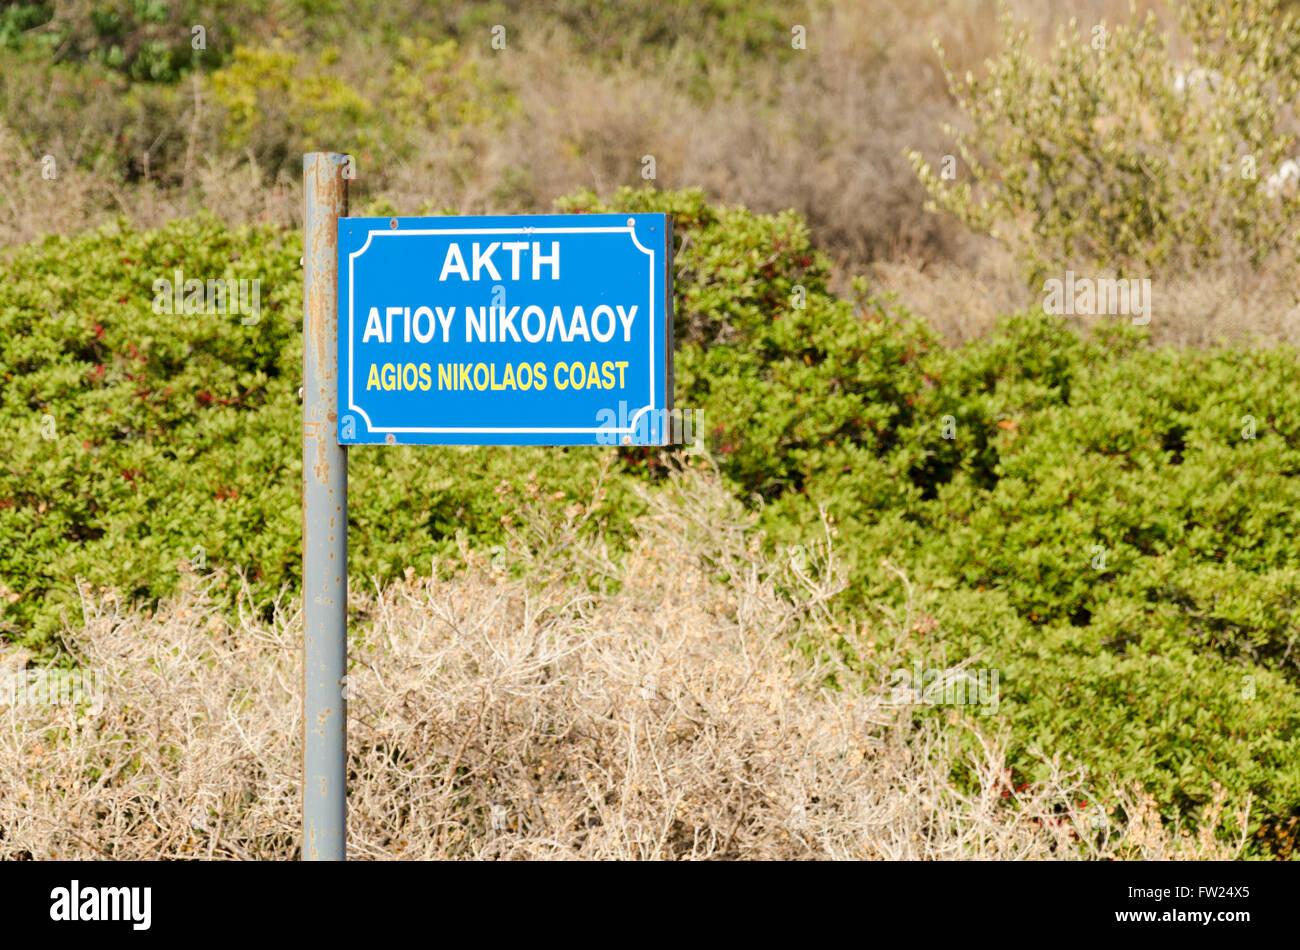 Agios Nikolaos Coast Sign, Crete, Greece - Stock Image